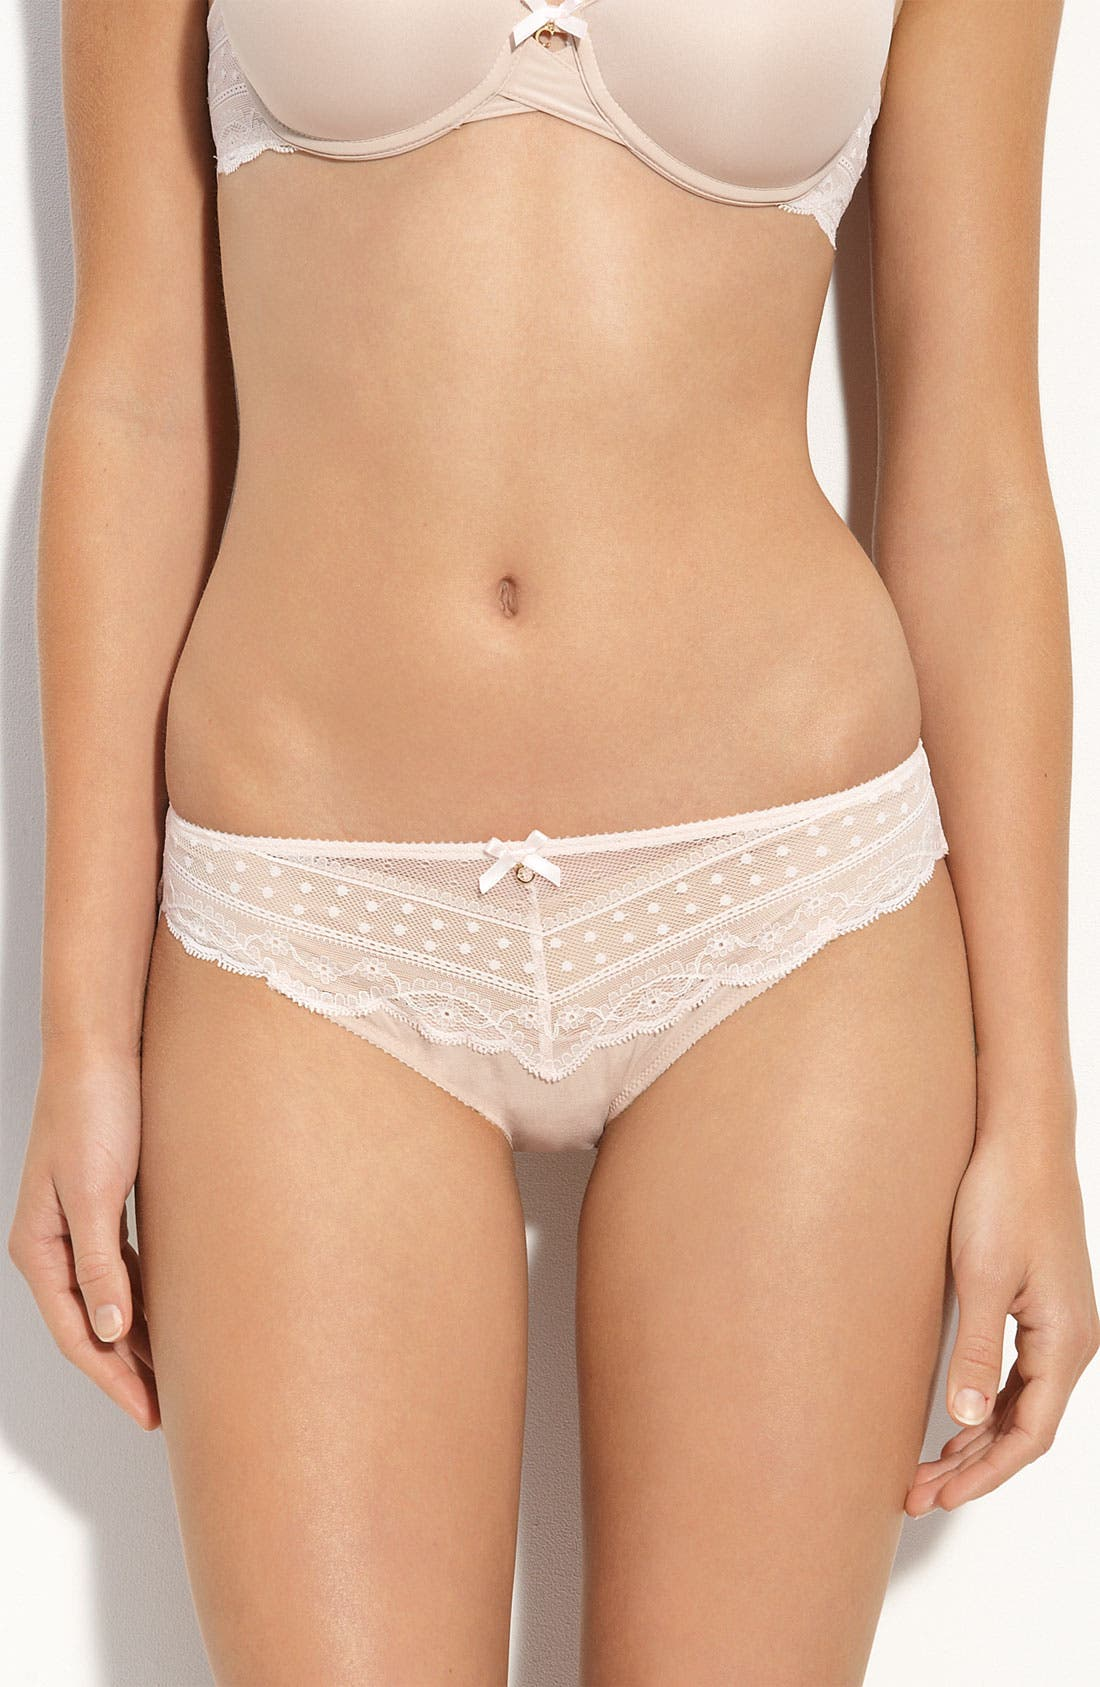 Main Image - Chantelle Intimates 'C Paris' Bikini